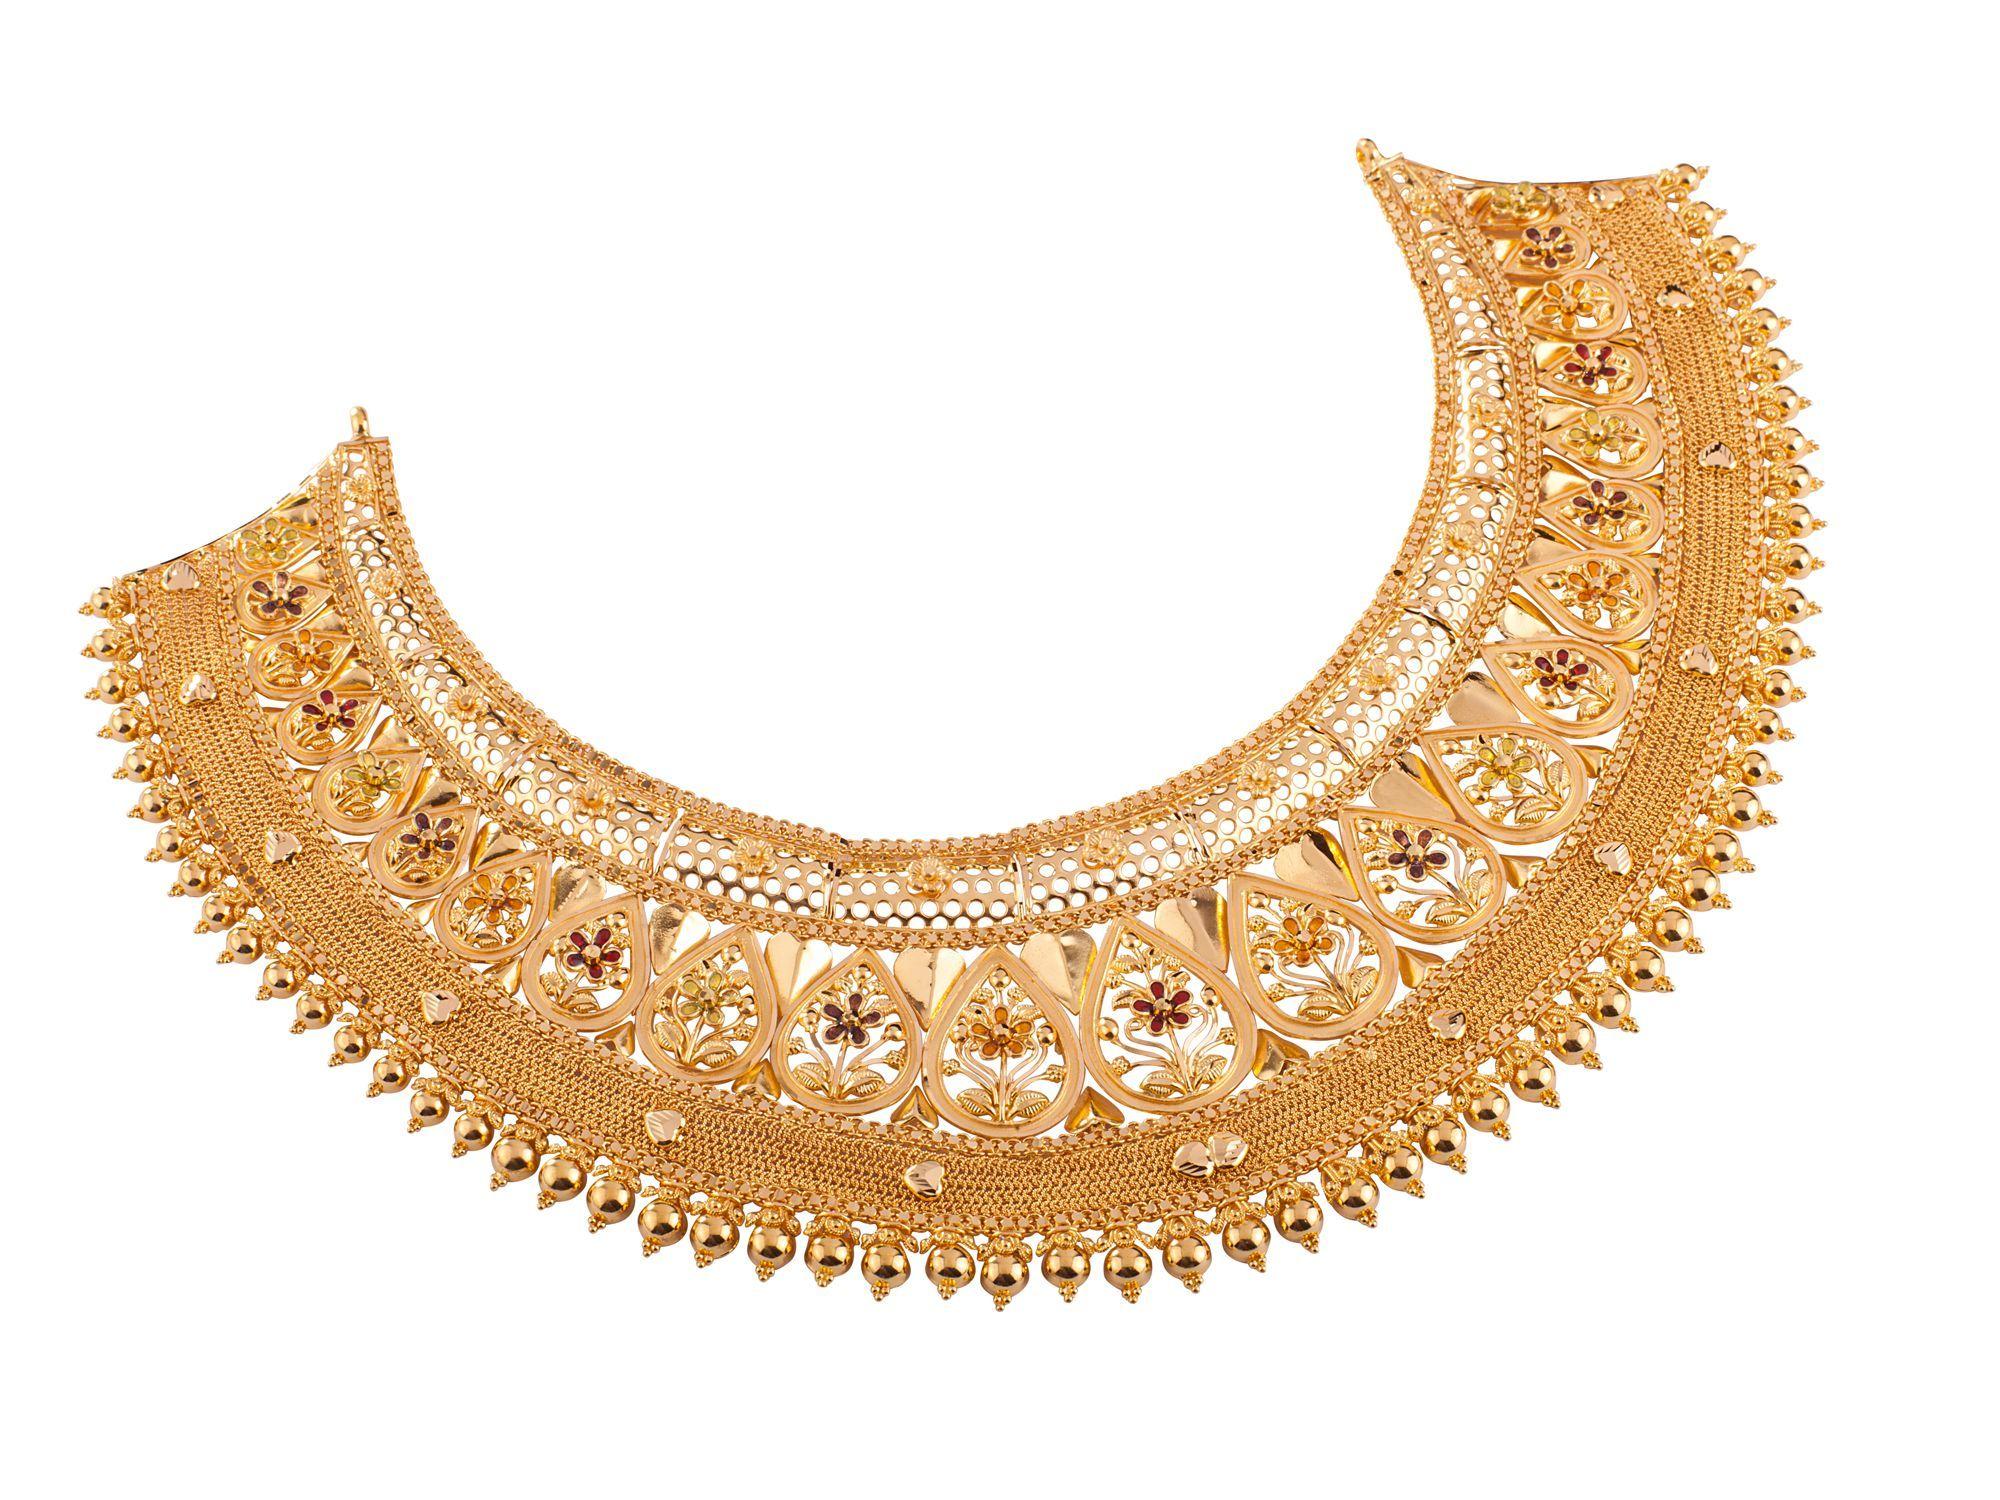 senco gold bangle - Google Search | gold jewellery | Pinterest ...